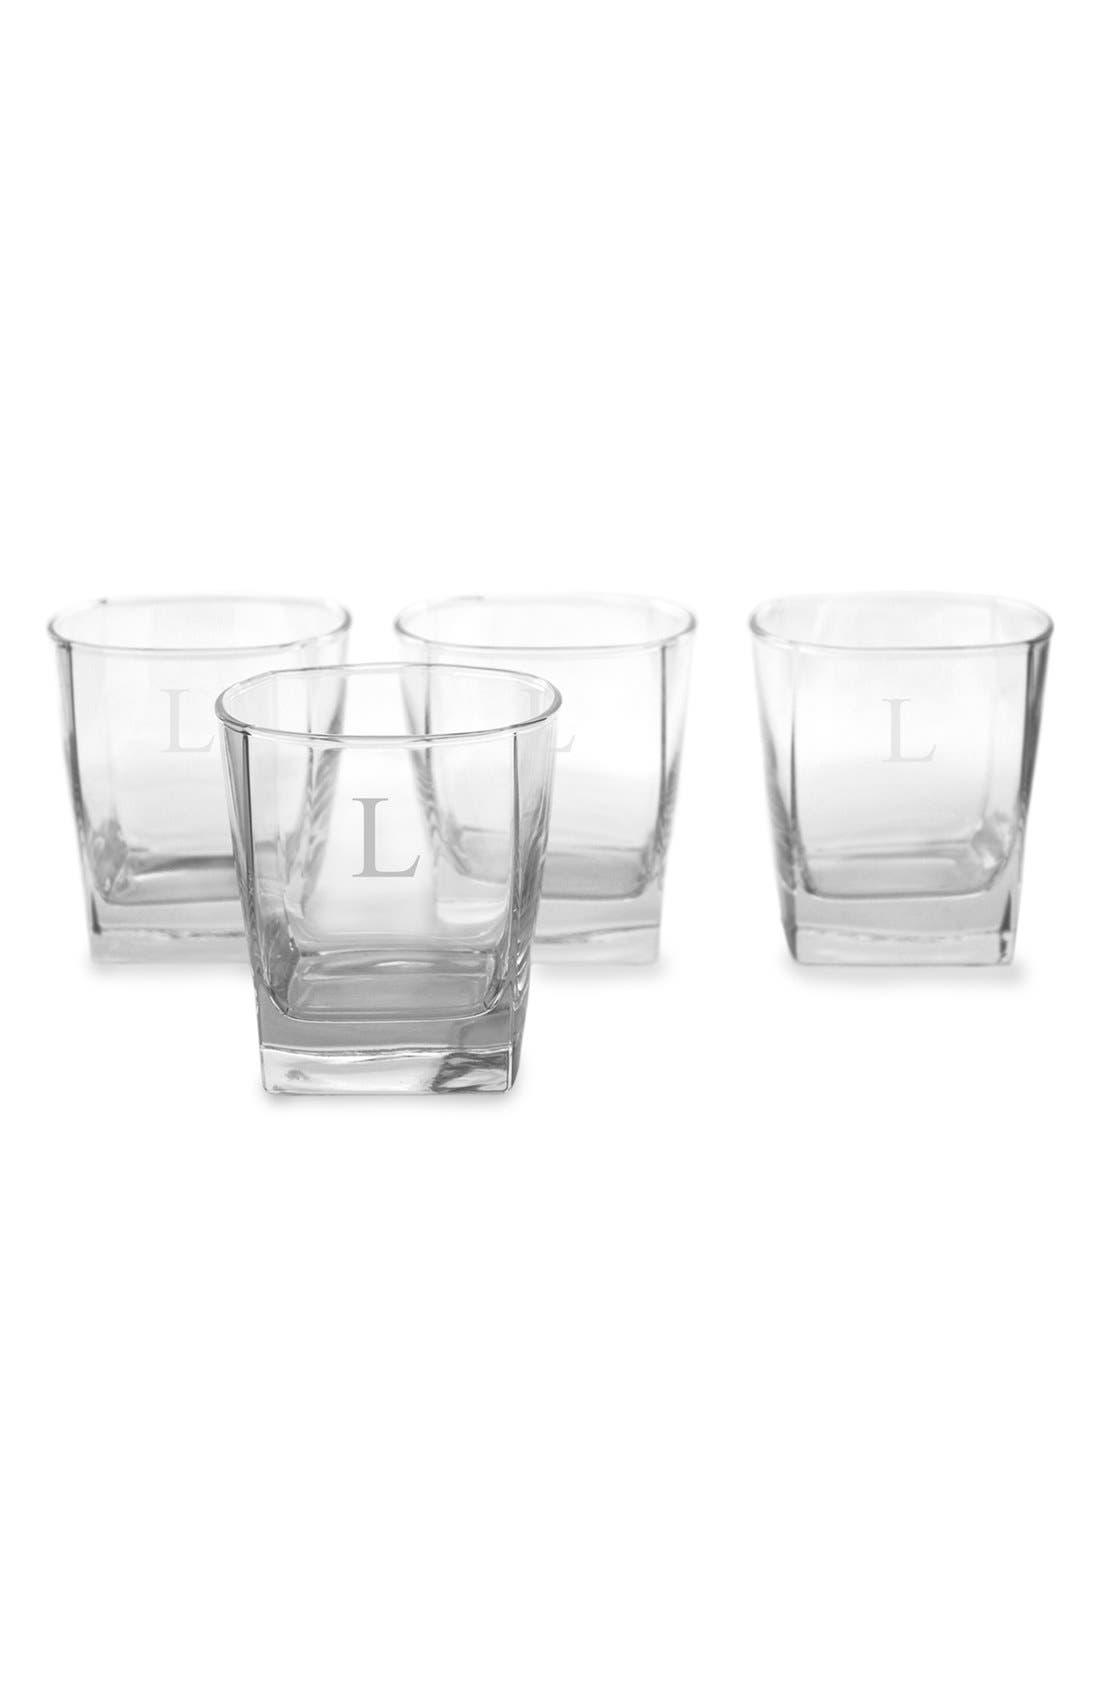 Alternate Image 1 Selected - Cathy's Concepts Monogram Rocks Glasses (Set of 4)